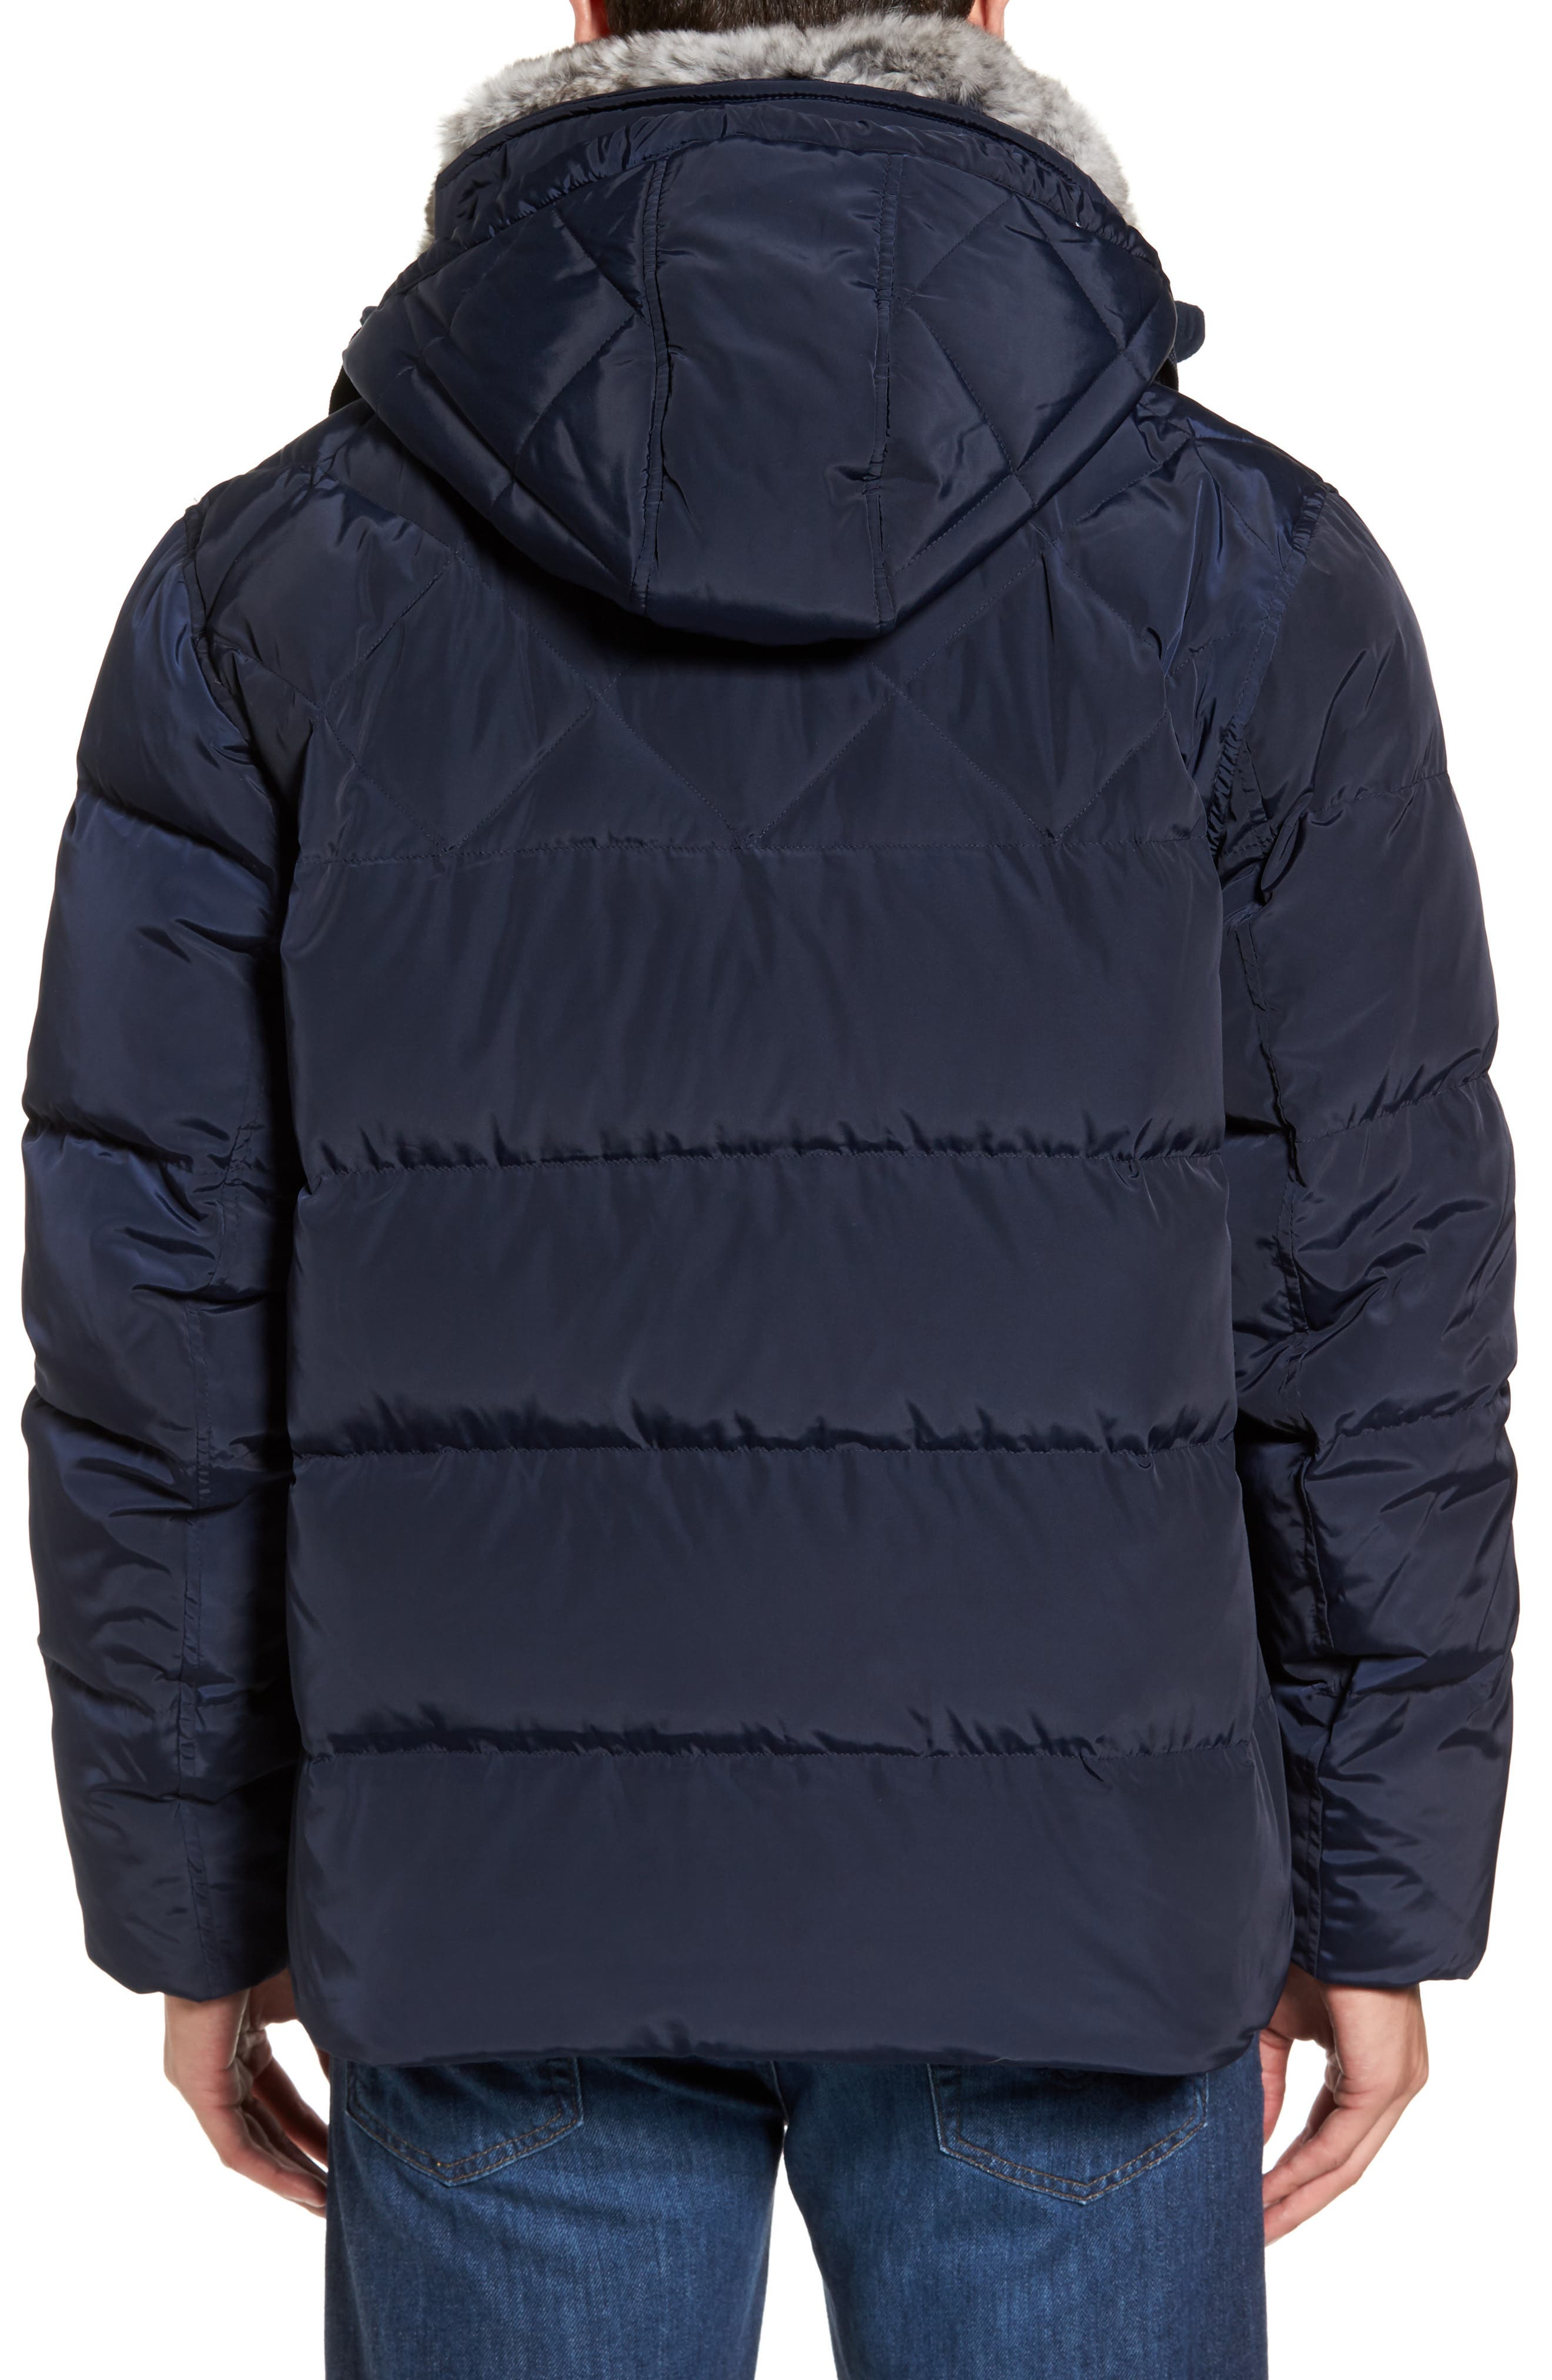 Alternate Image 2  - Marc New York Navan Quilted Down Jacket with Genuine Rabbit Fur Trim